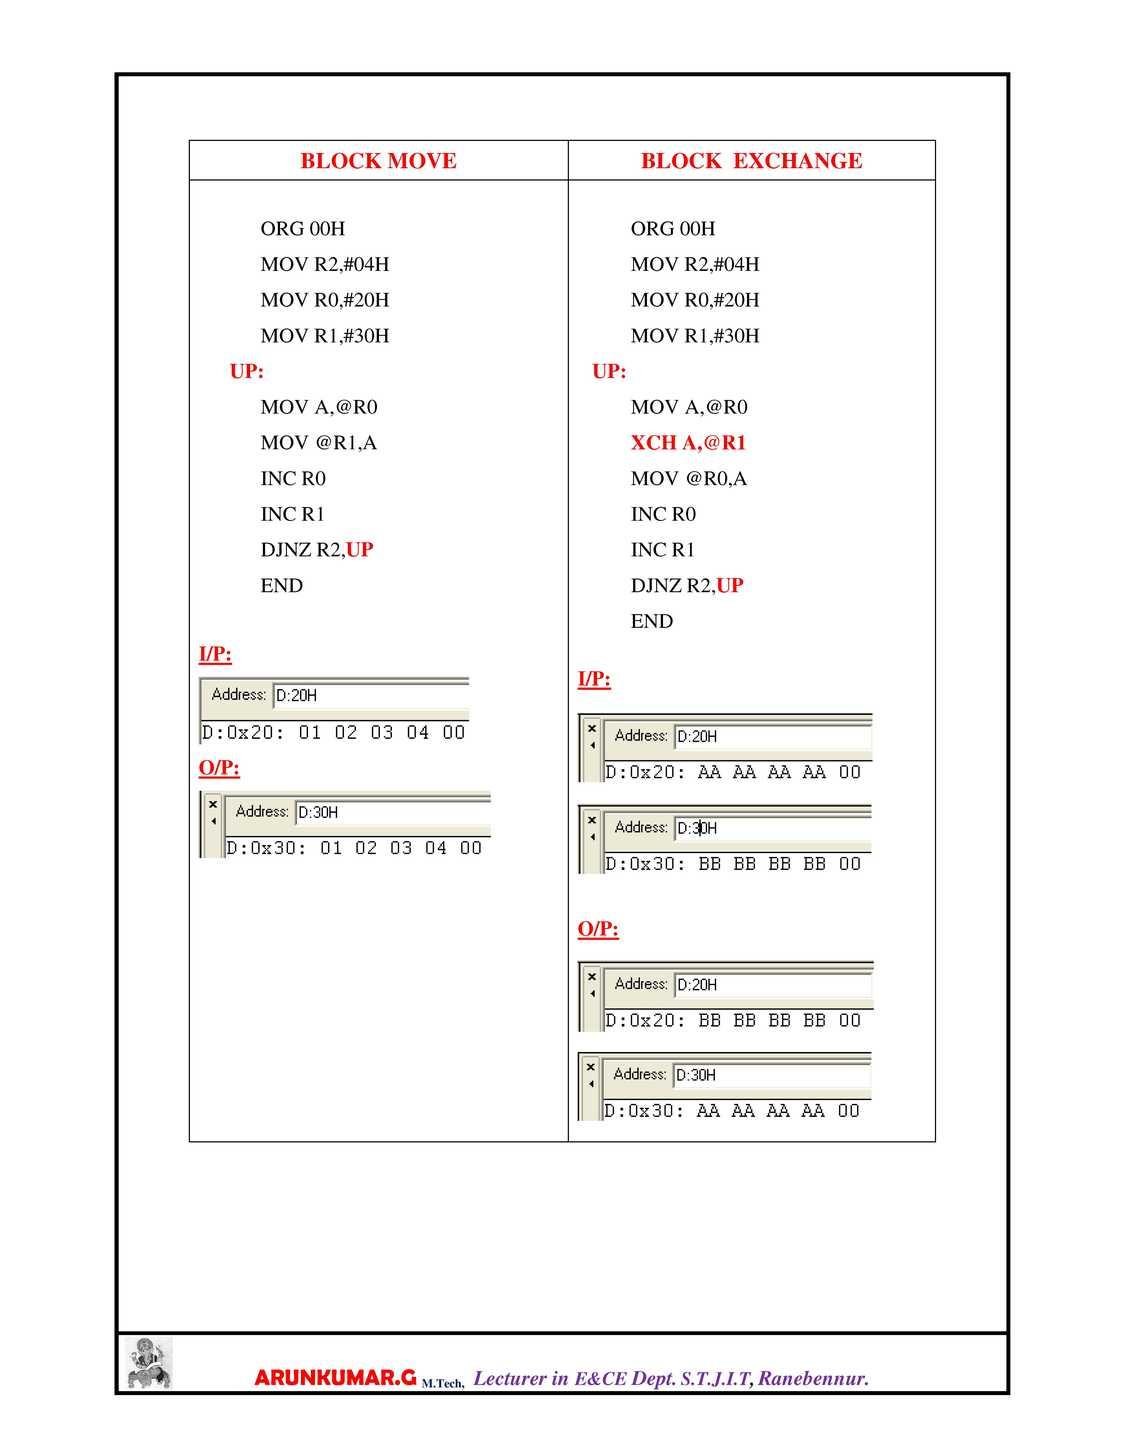 vtu microcontroller lab manual 2018 2019 eduvark rh eduvark com 8051 microcontroller lab programs vtu 8051 microcontroller lab programs vtu